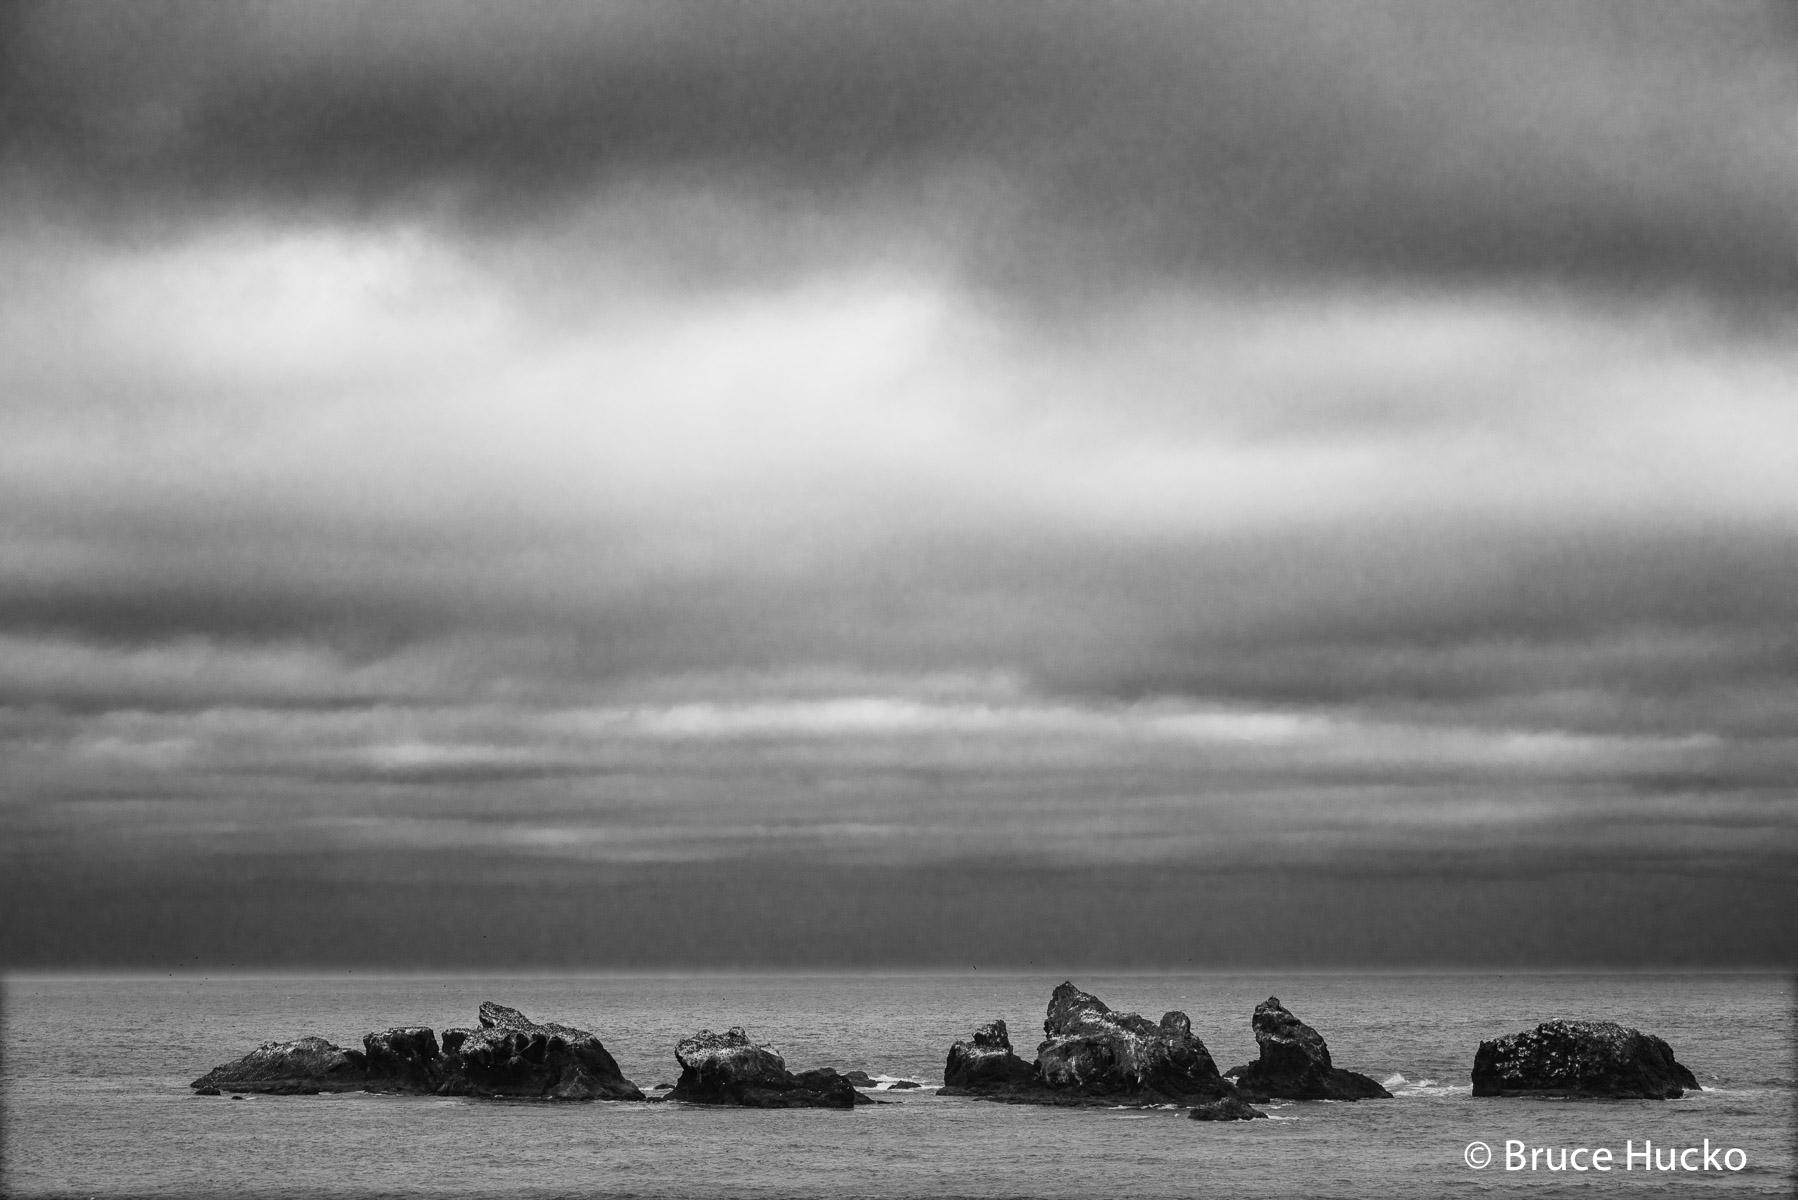 Bandon, Bandon Beach, Coast Trip 2016, Oregon Coast, road trip 2016, photo